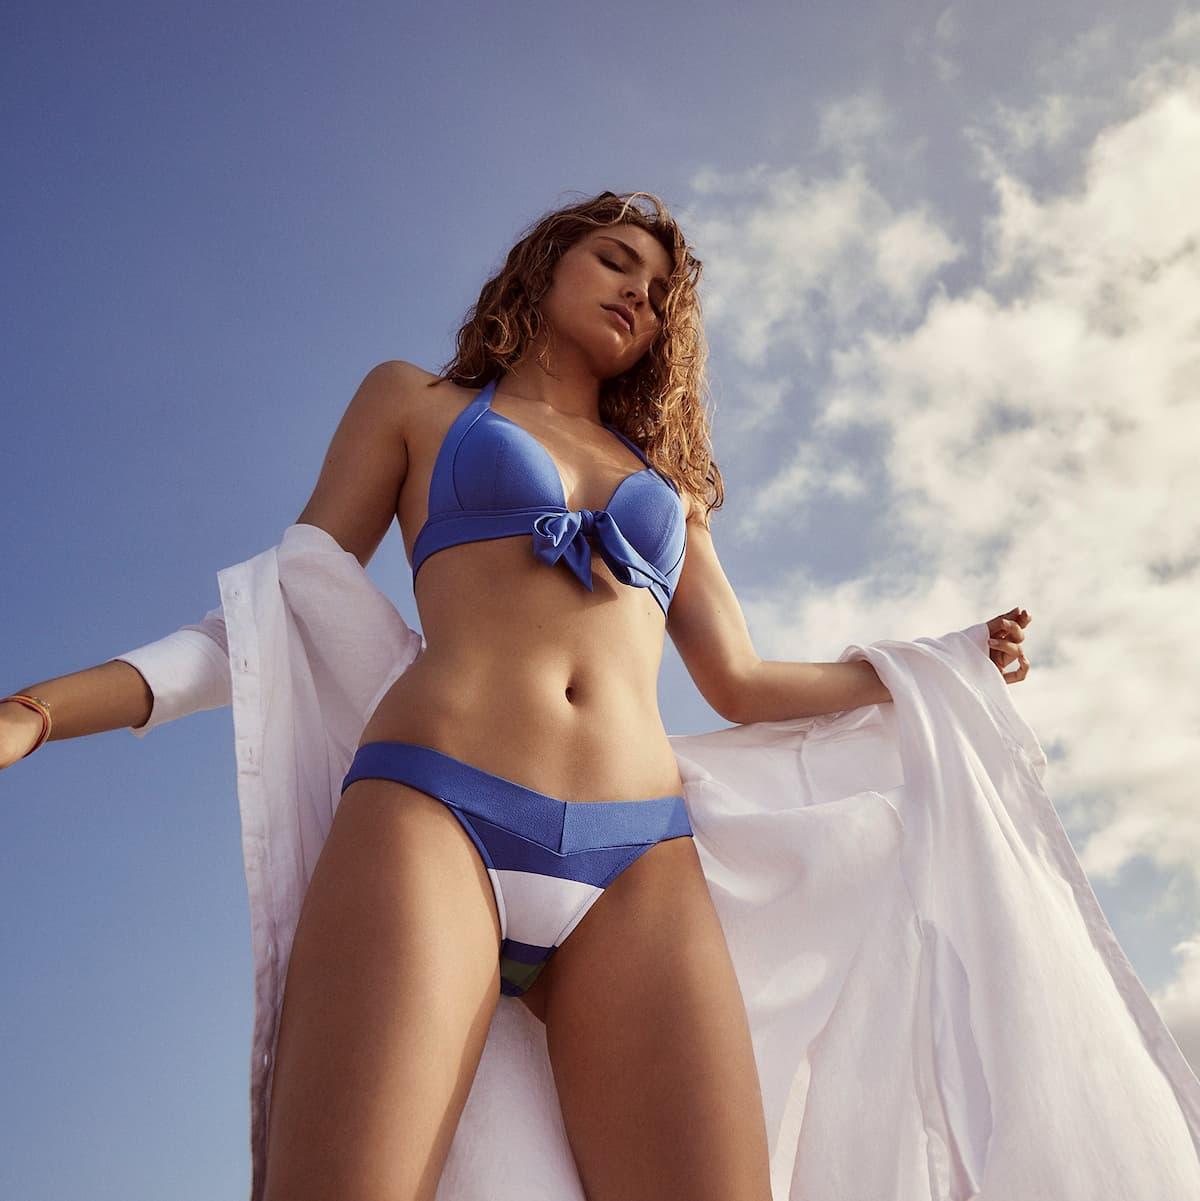 Andres Sarda Bkini 2021, Modell Elsa in Blau mit Streifen